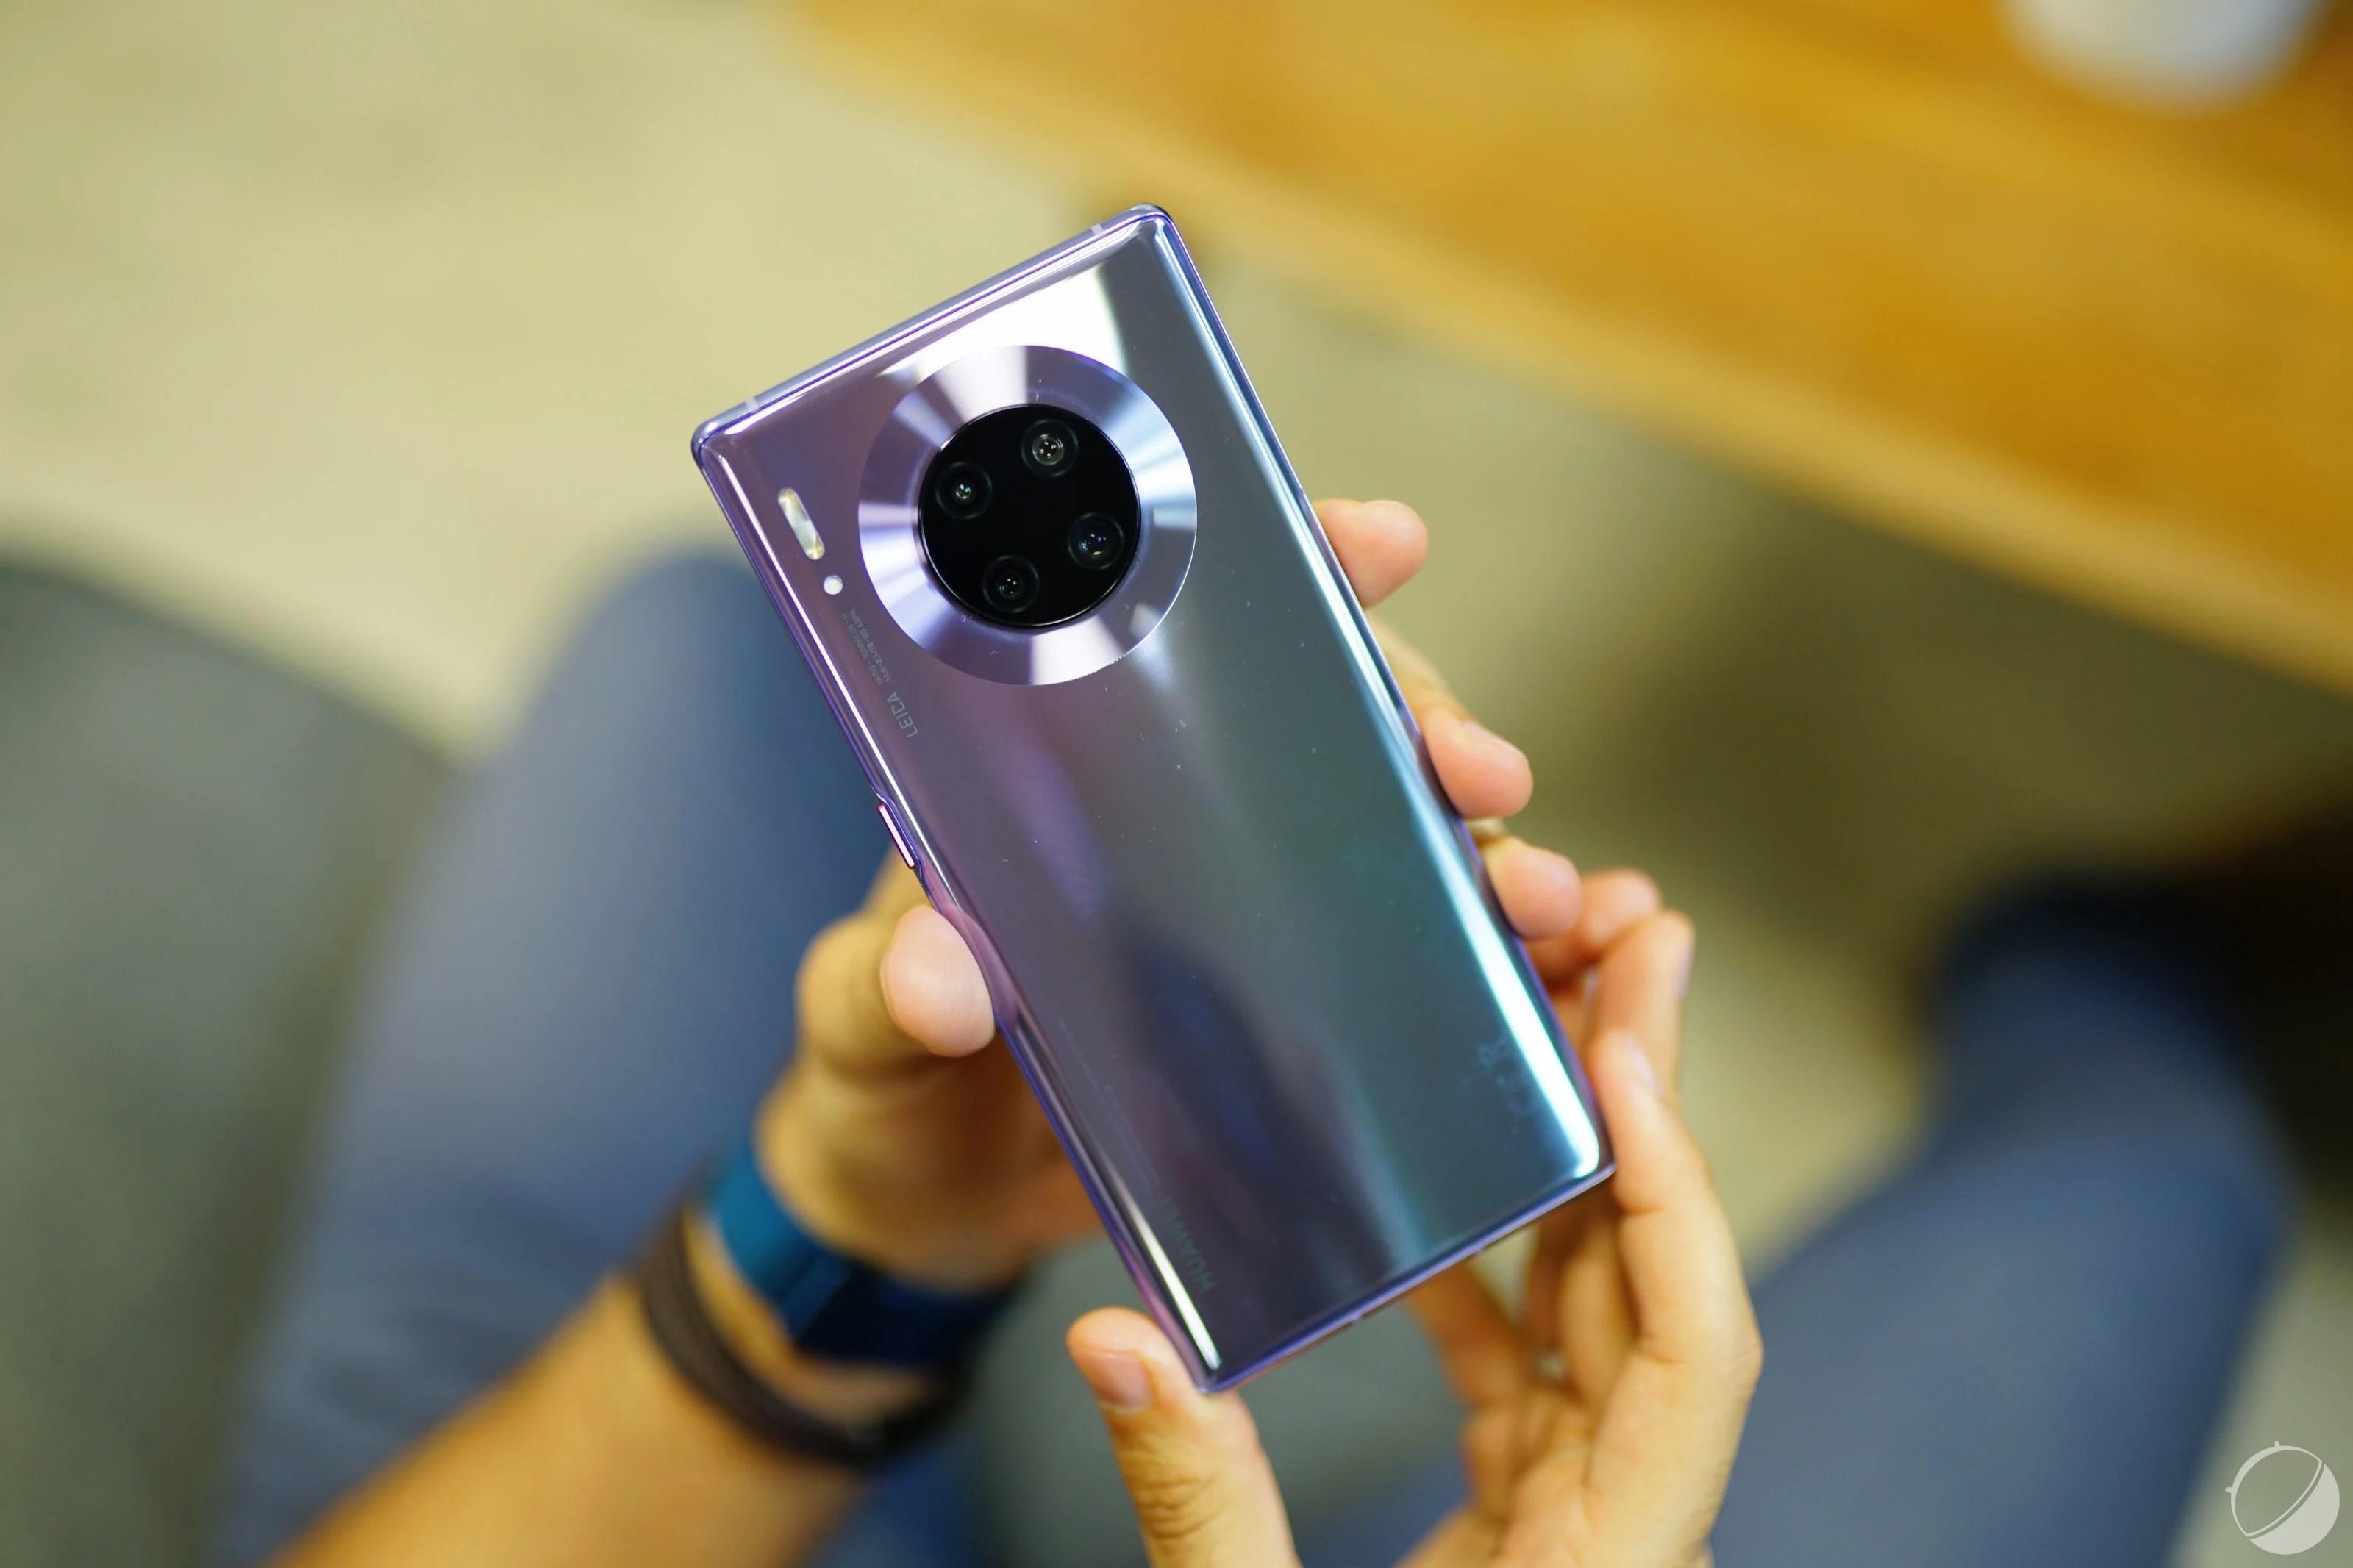 N'enterrons pas Huawei trop rapidement en France